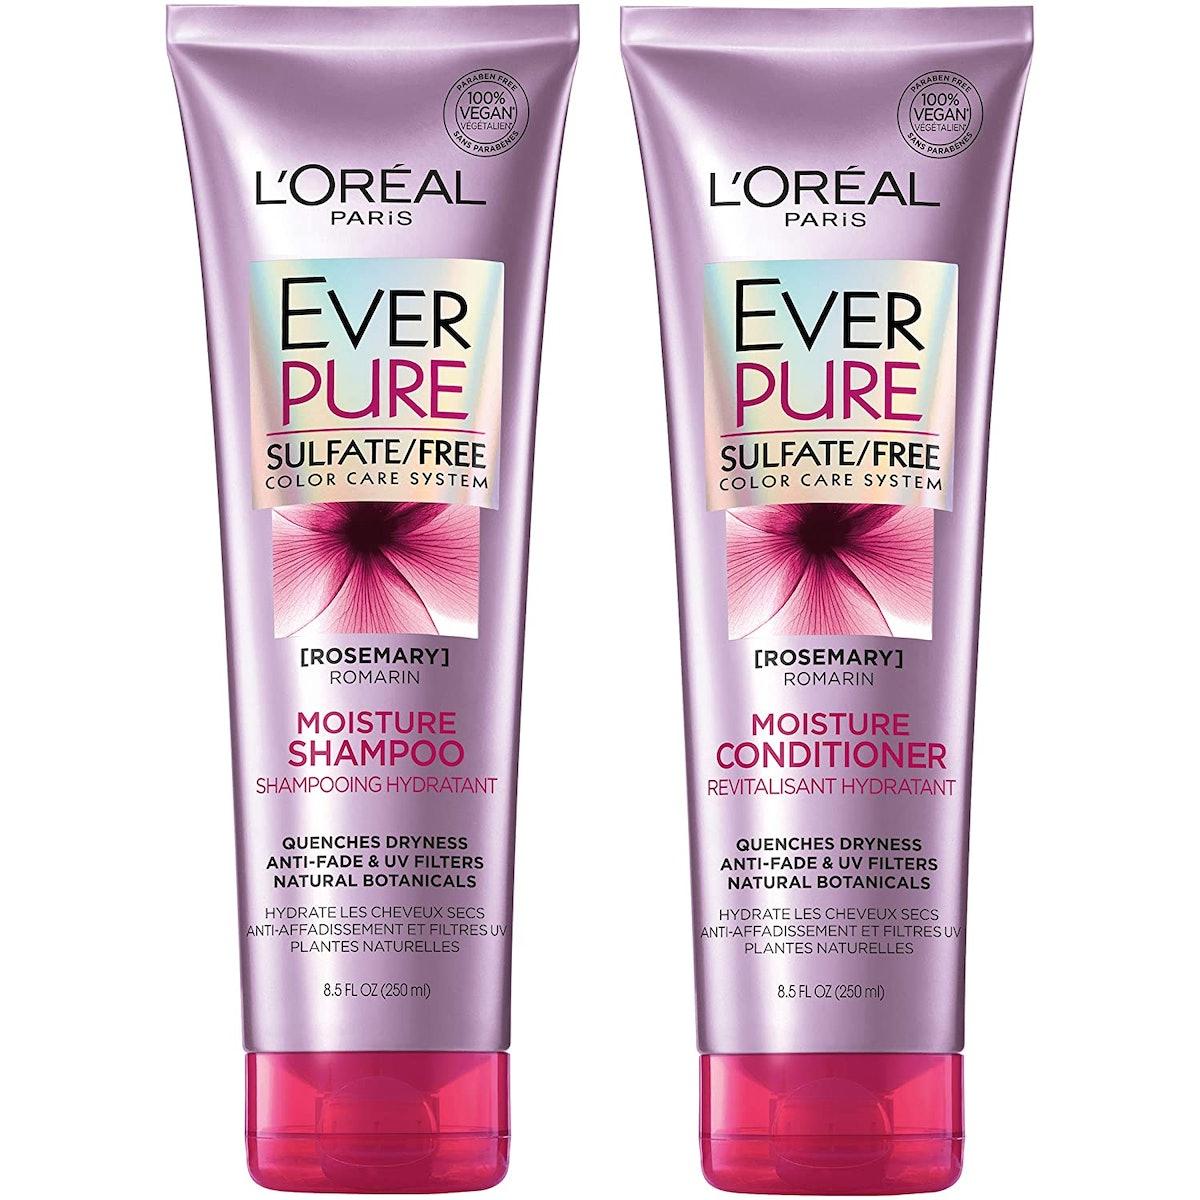 L'Oreal Paris EverPure Moisture Shampoo & Conditioner